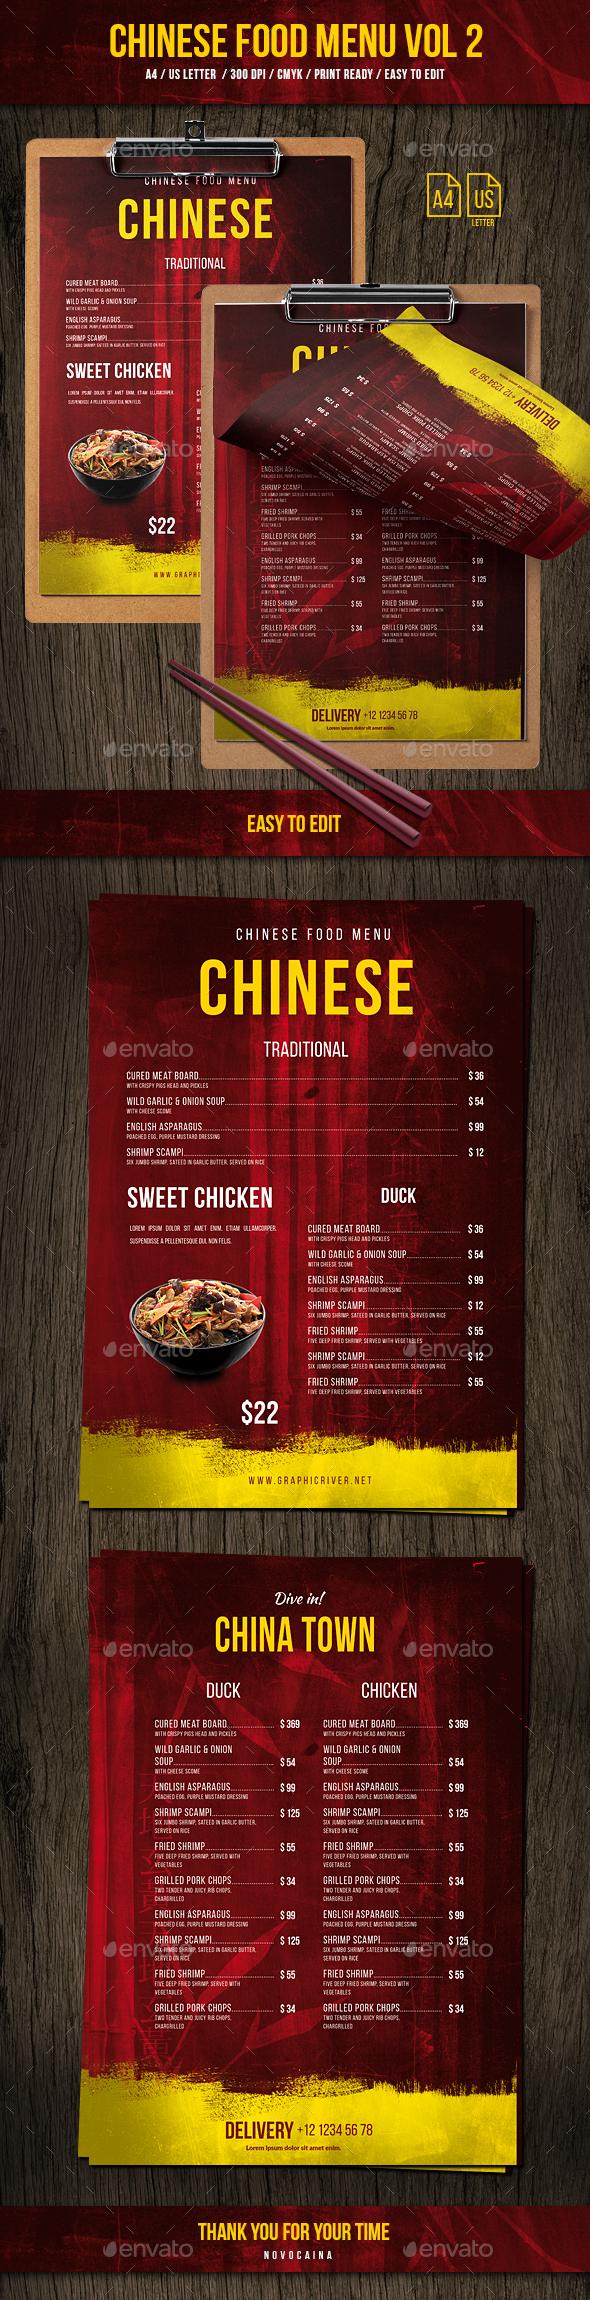 Chinese A4 & US Letter Single Page Food Menu Vol 2 - Food Menus Print Templates